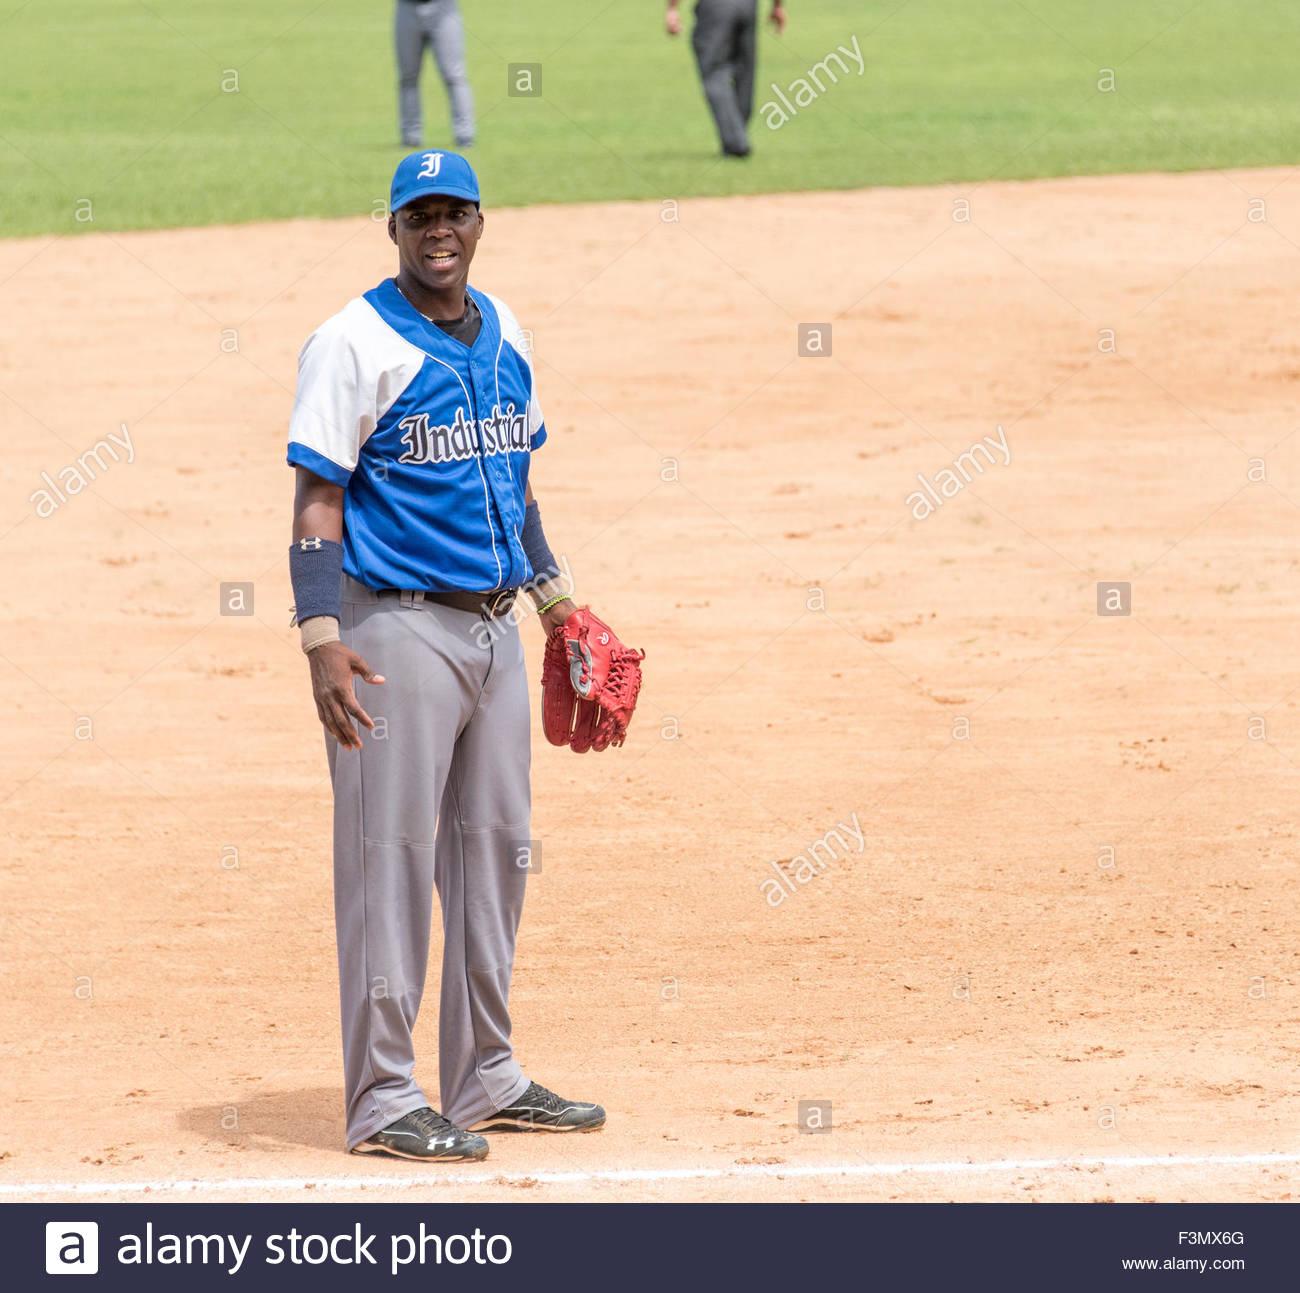 cuban baseball, team Industriales vs Villa Clara,Rudy Reyes wearing the Industriales colors - Stock Image